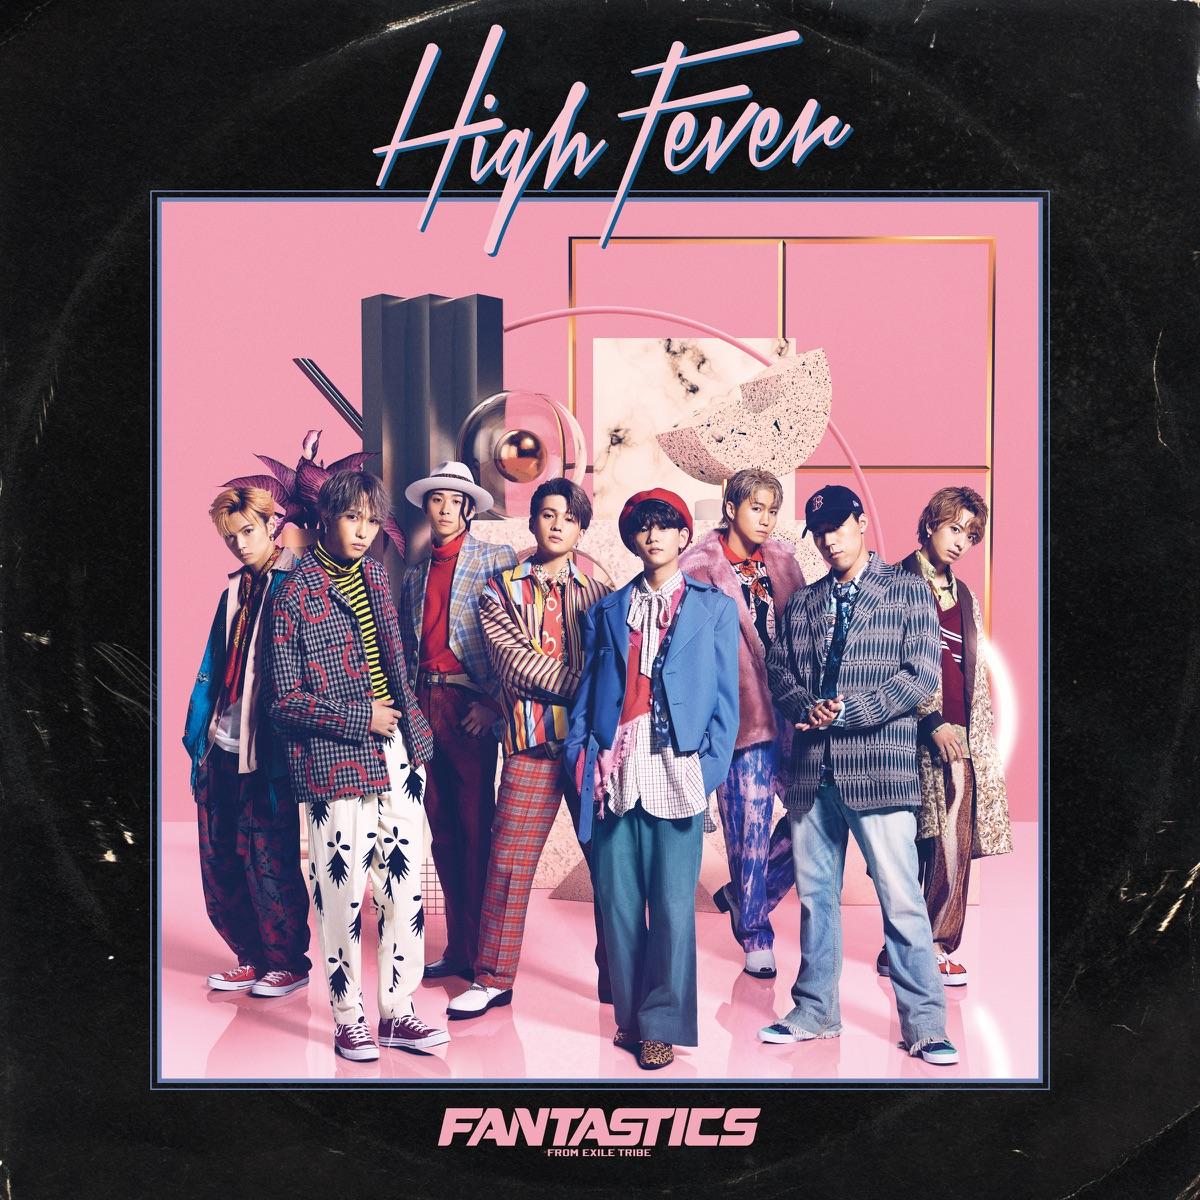 『FANTASTICS from EXILE TRIBE - High Fever』収録の『High Fever』ジャケット